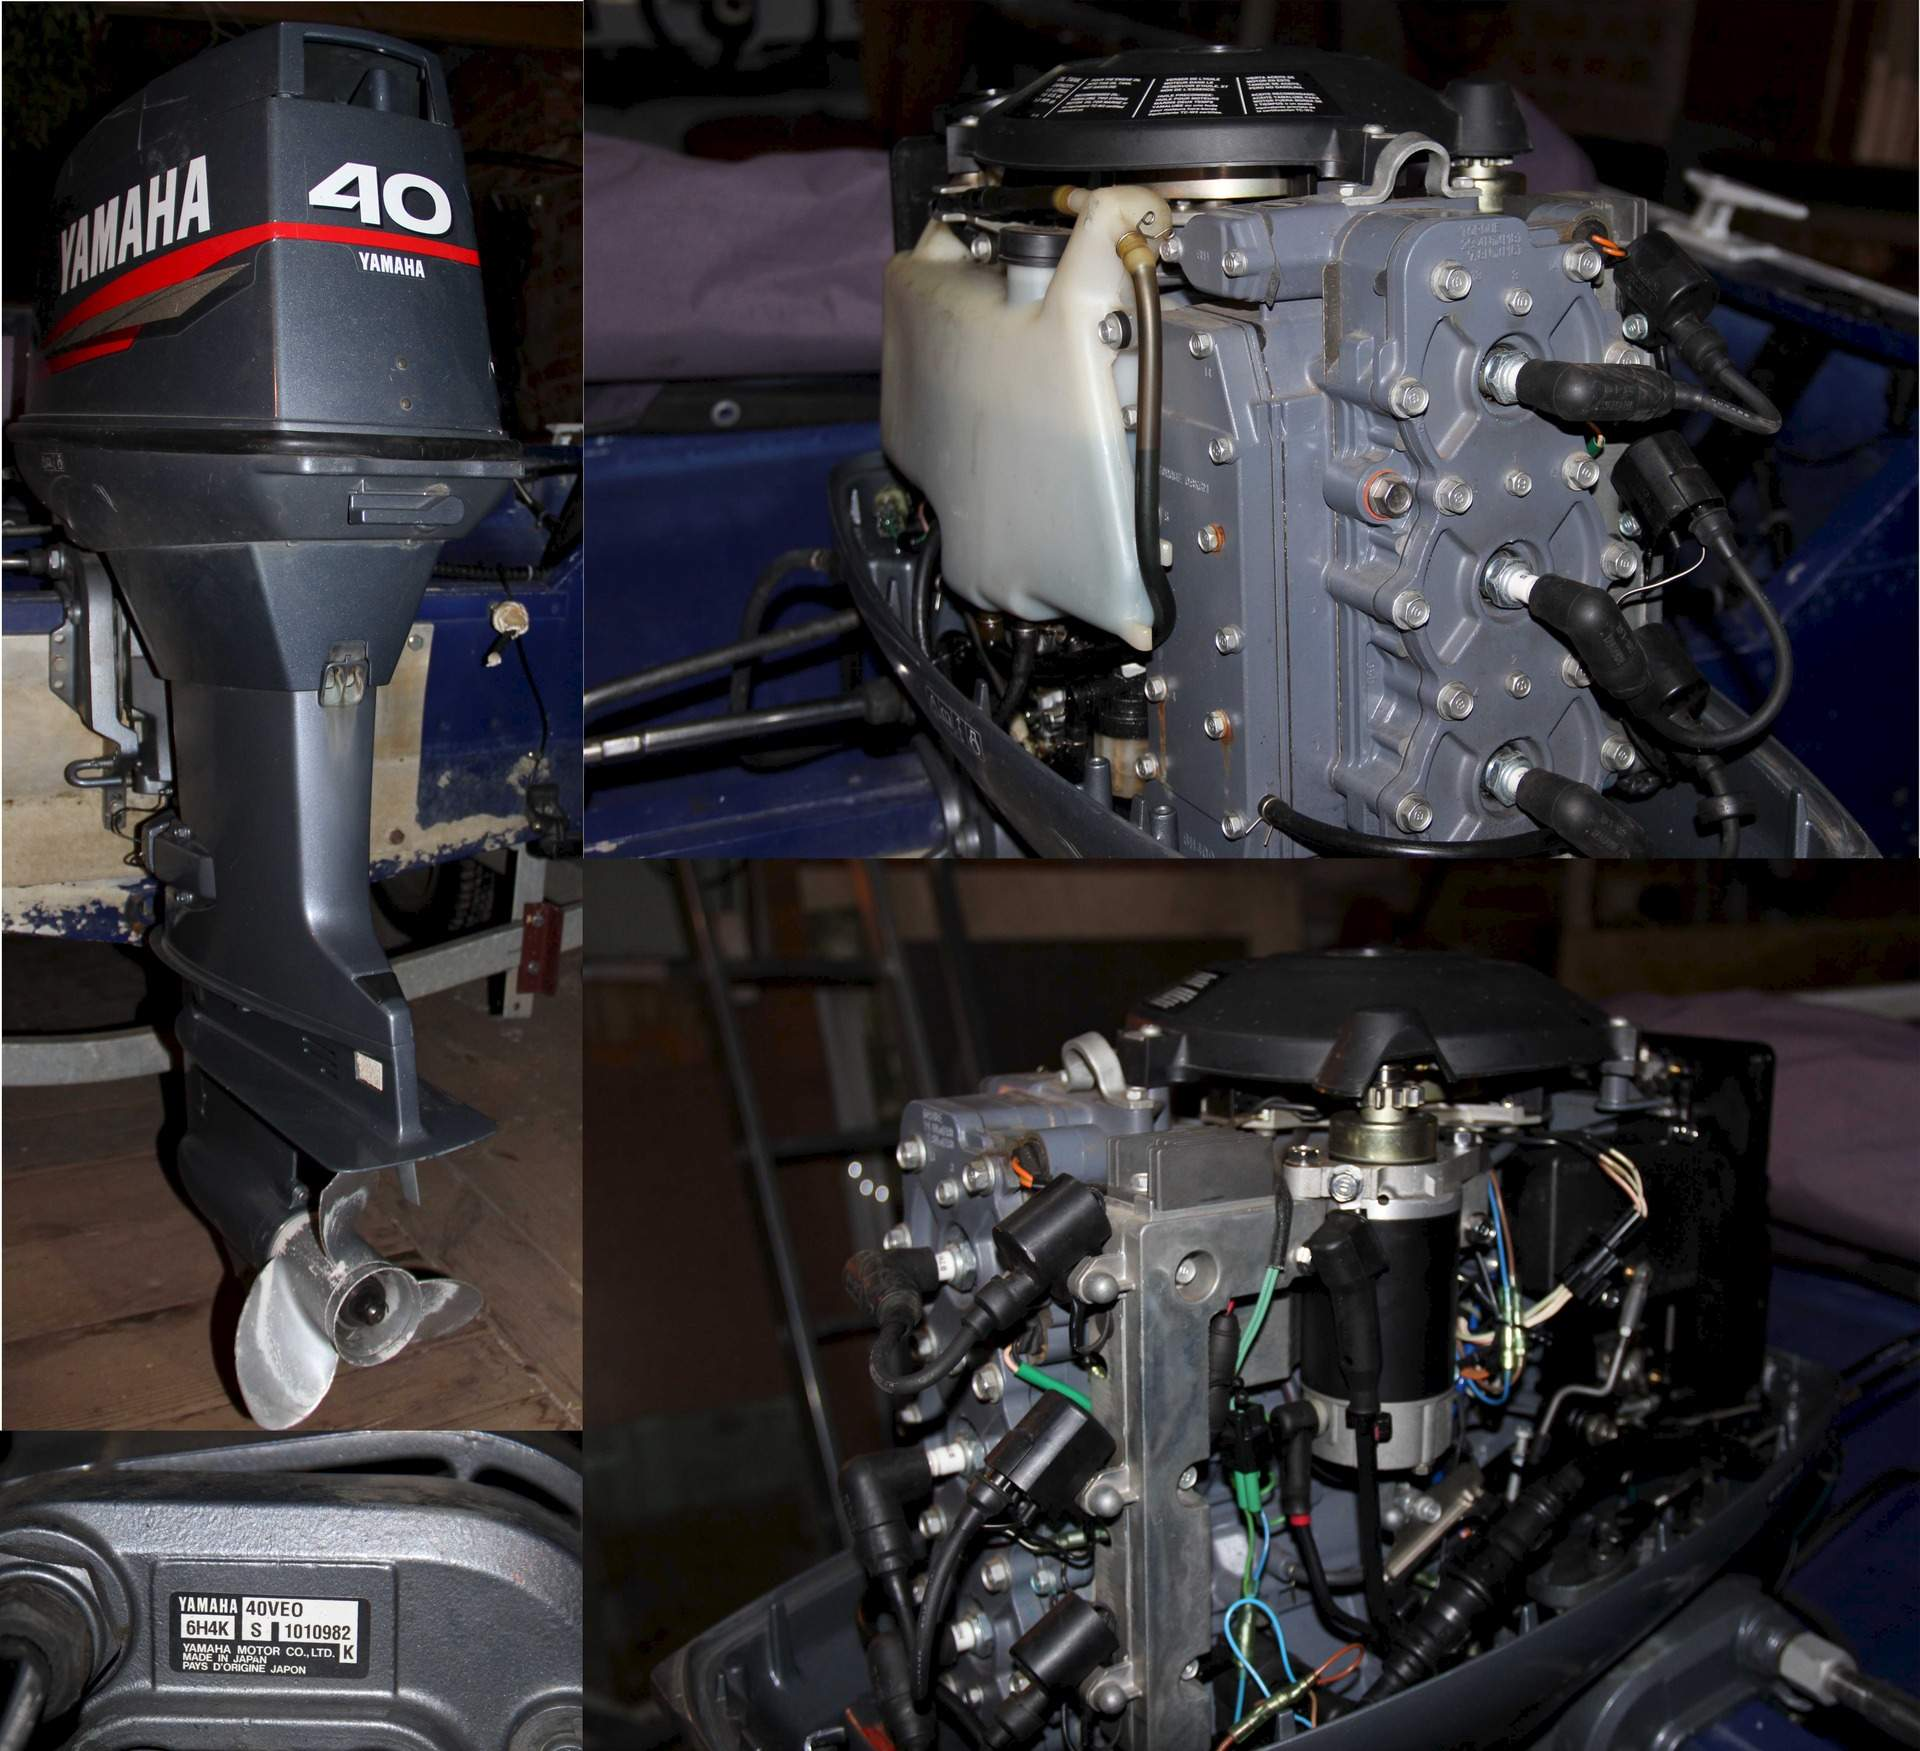 таблица обкатка лодочного мотора ямаха 40 веос